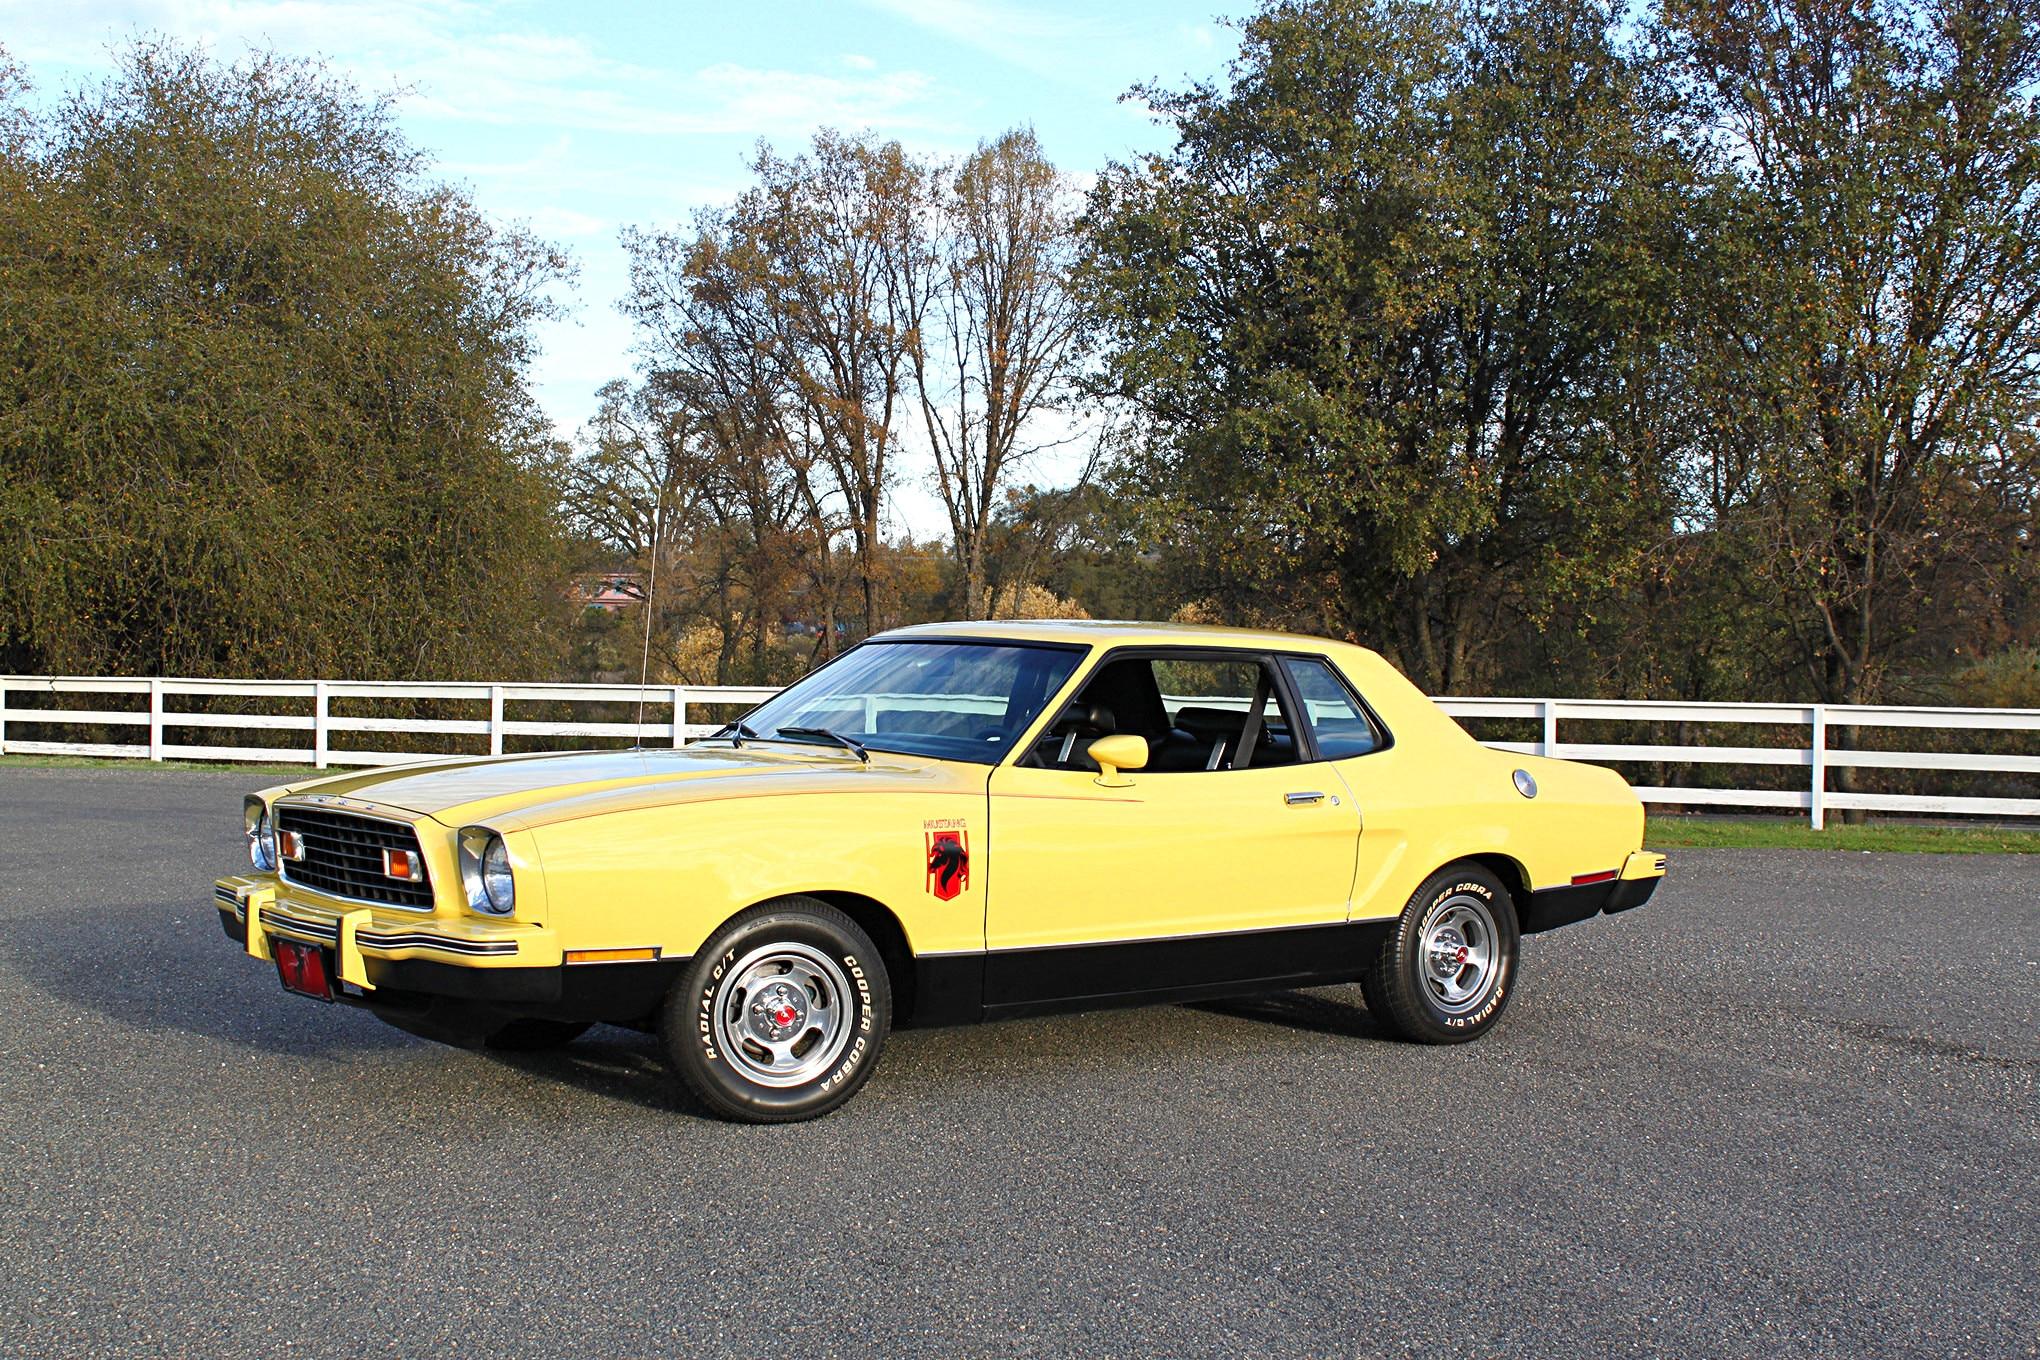 1976 Mustang II Stallion Front Quarter Side